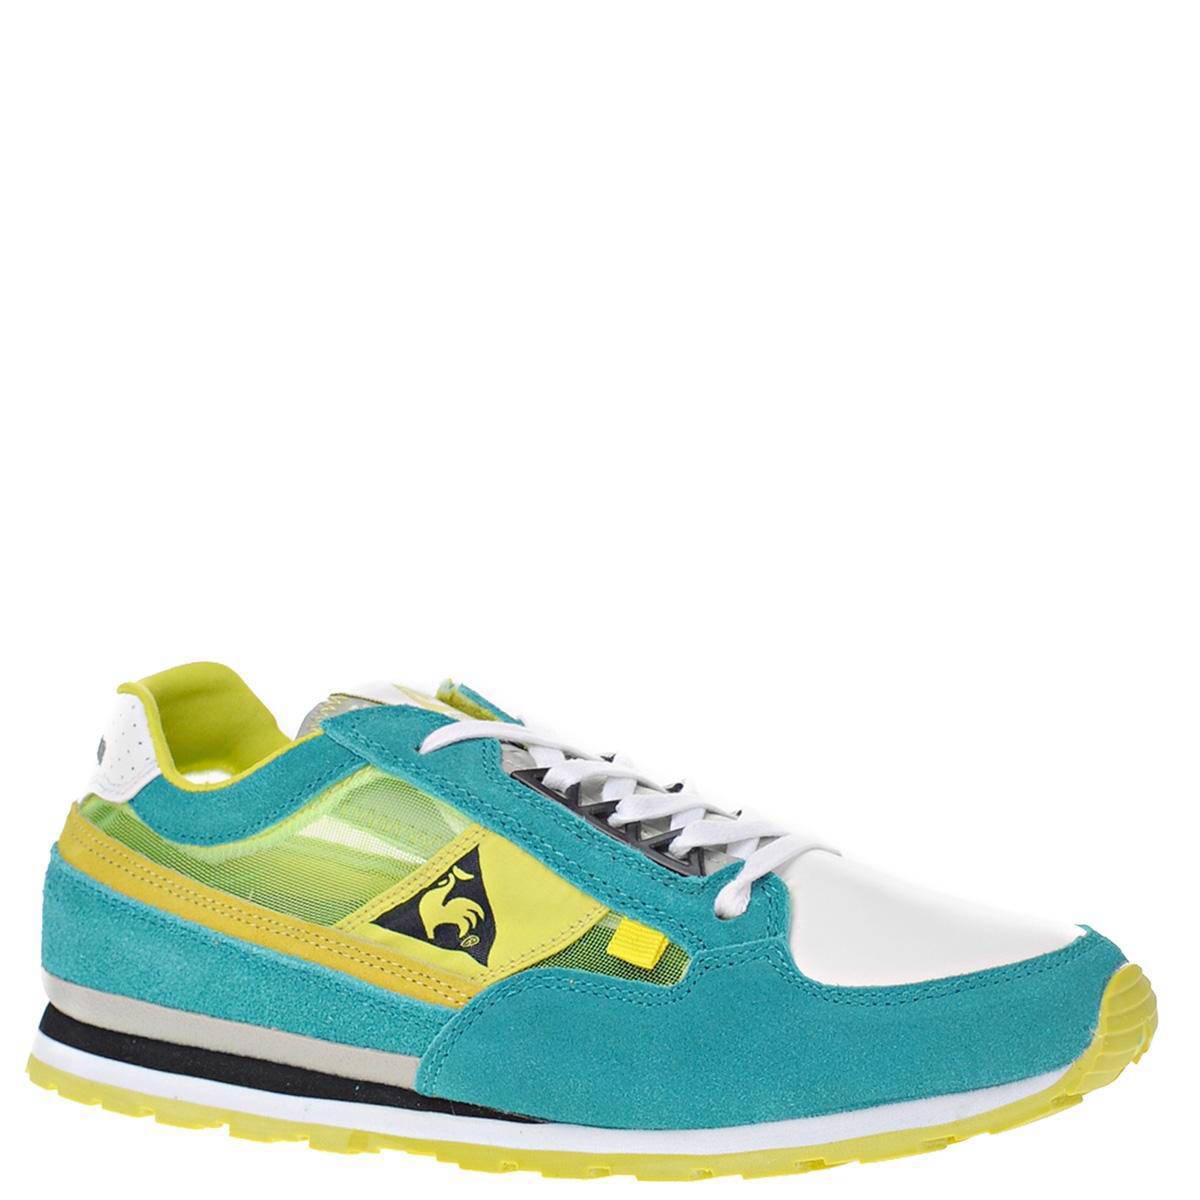 Le Sportif Sneakers Wehkamp Coq Le Sneakers Wehkamp Sportif Le Coq qAgxnF